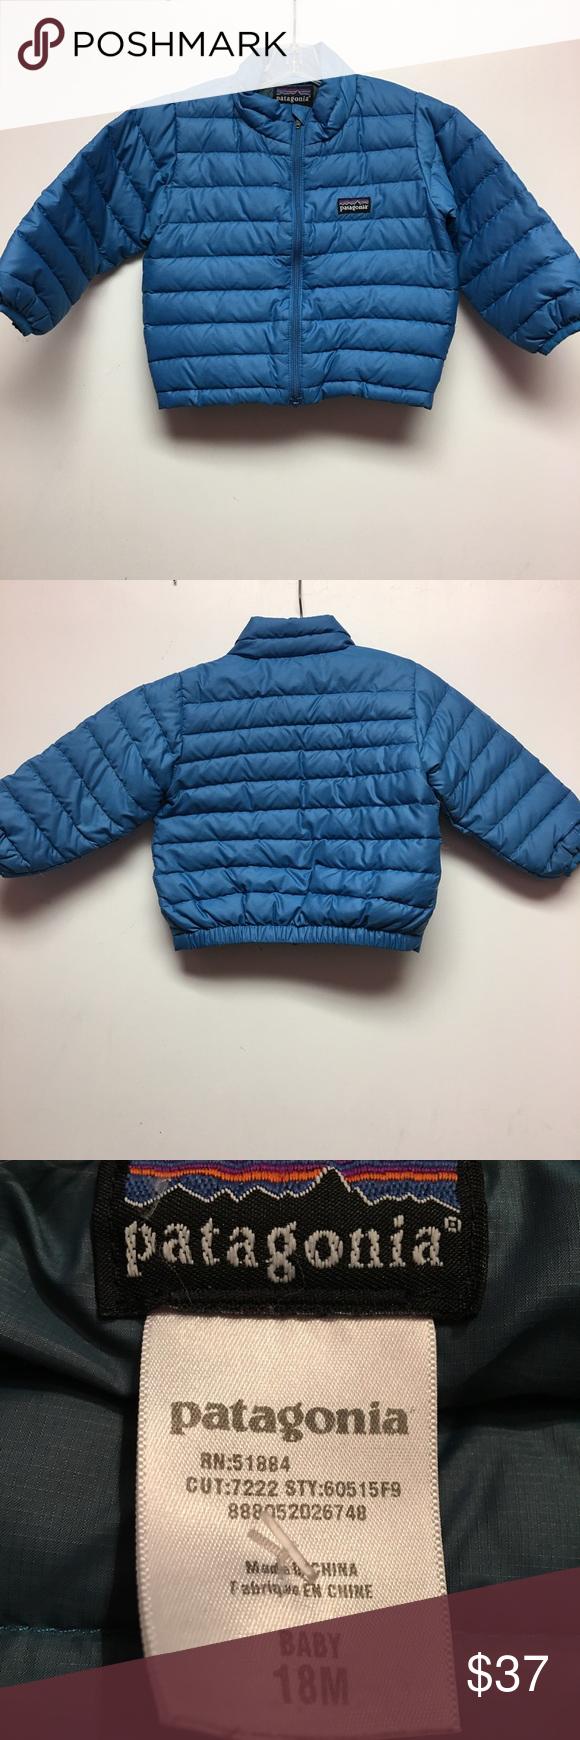 Patagonia 18m puffer jacket sweater light blue Sweaters